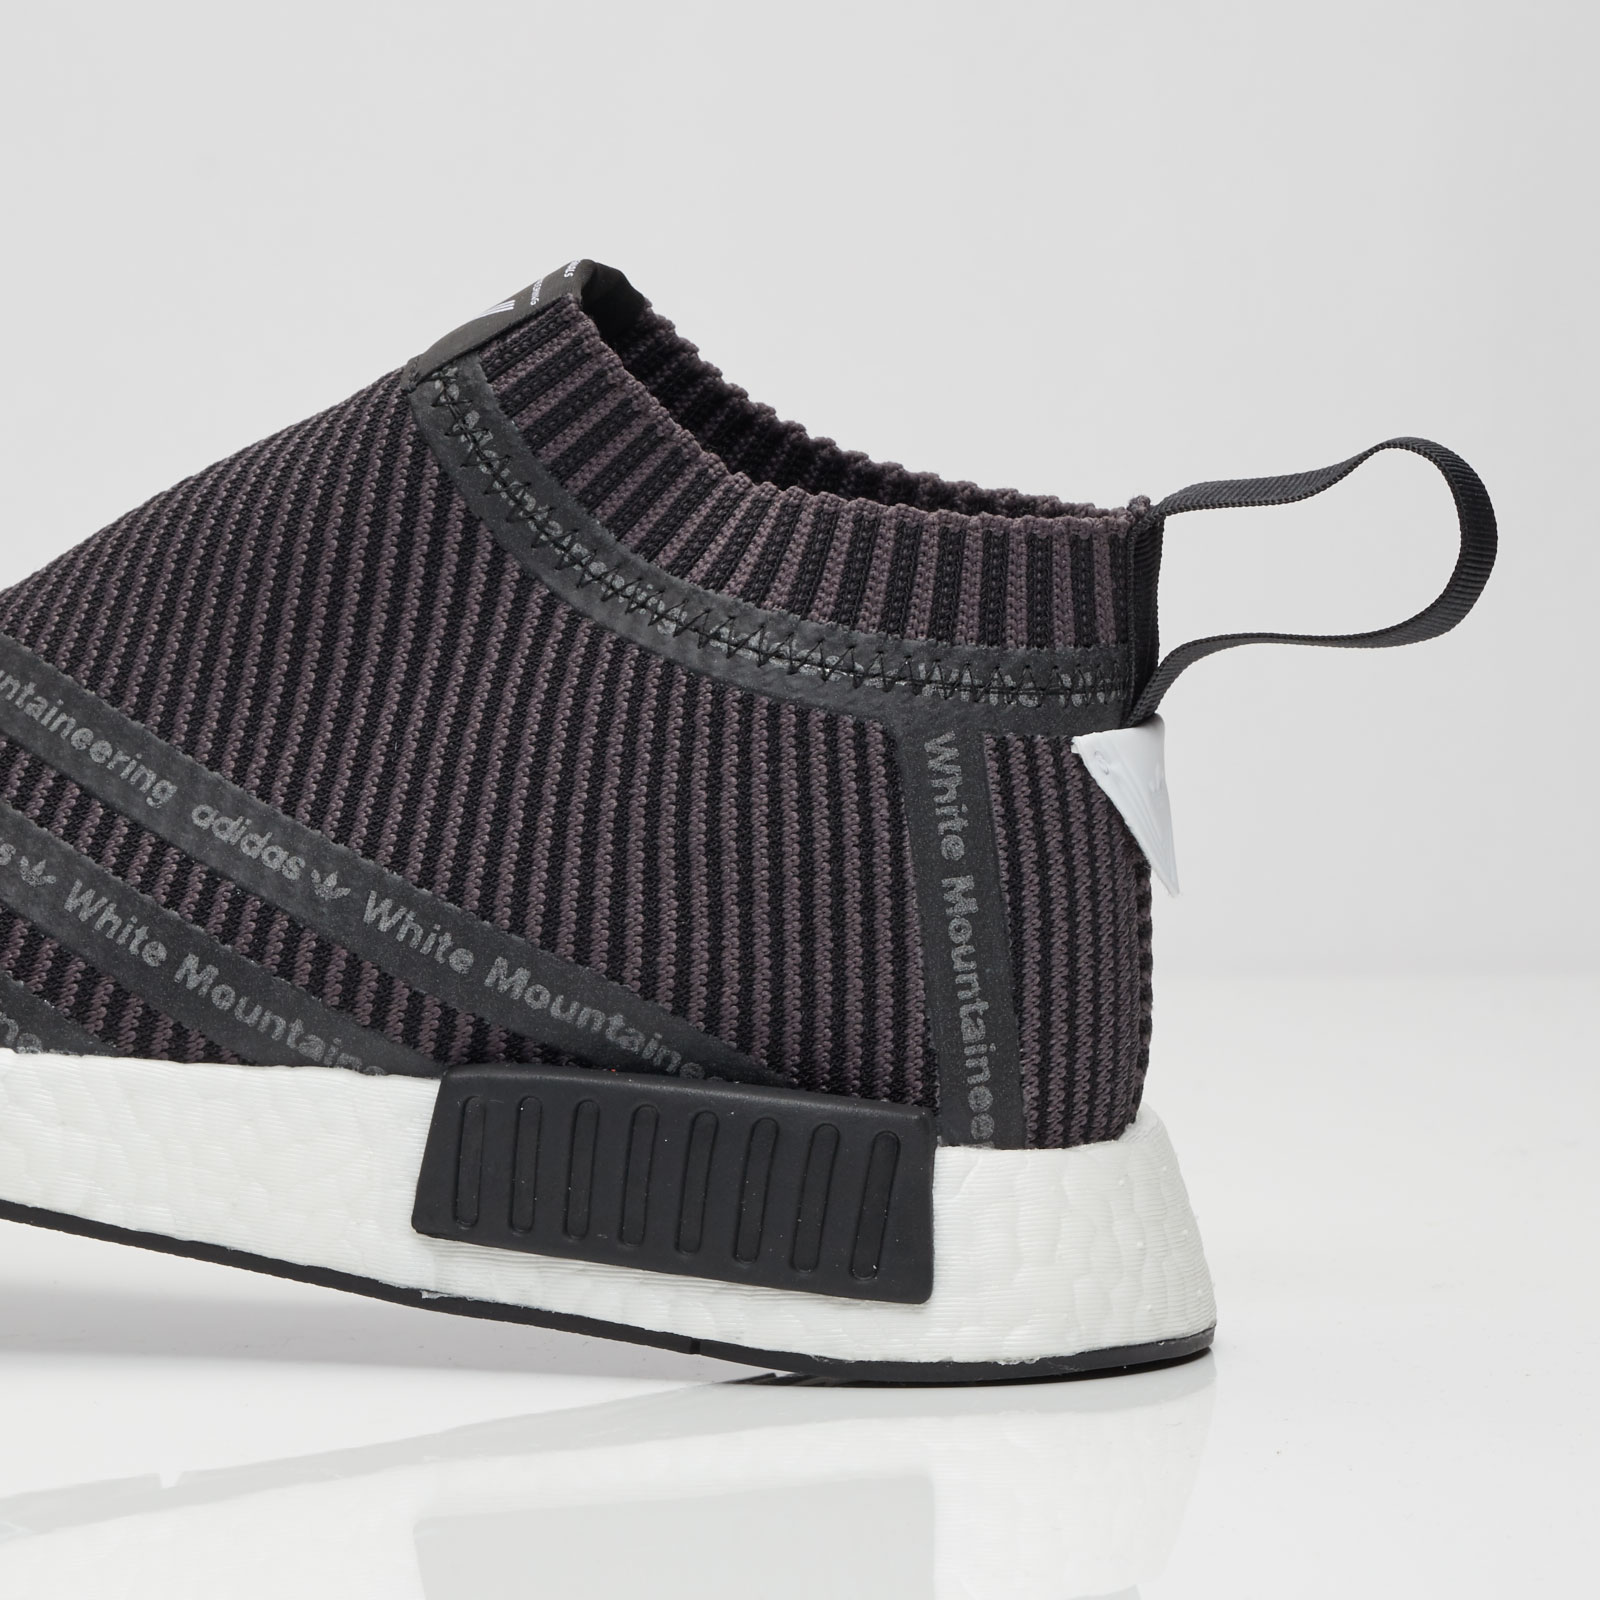 c9b94a25a adidas WM NMD City Sock - S80529 - Sneakersnstuff